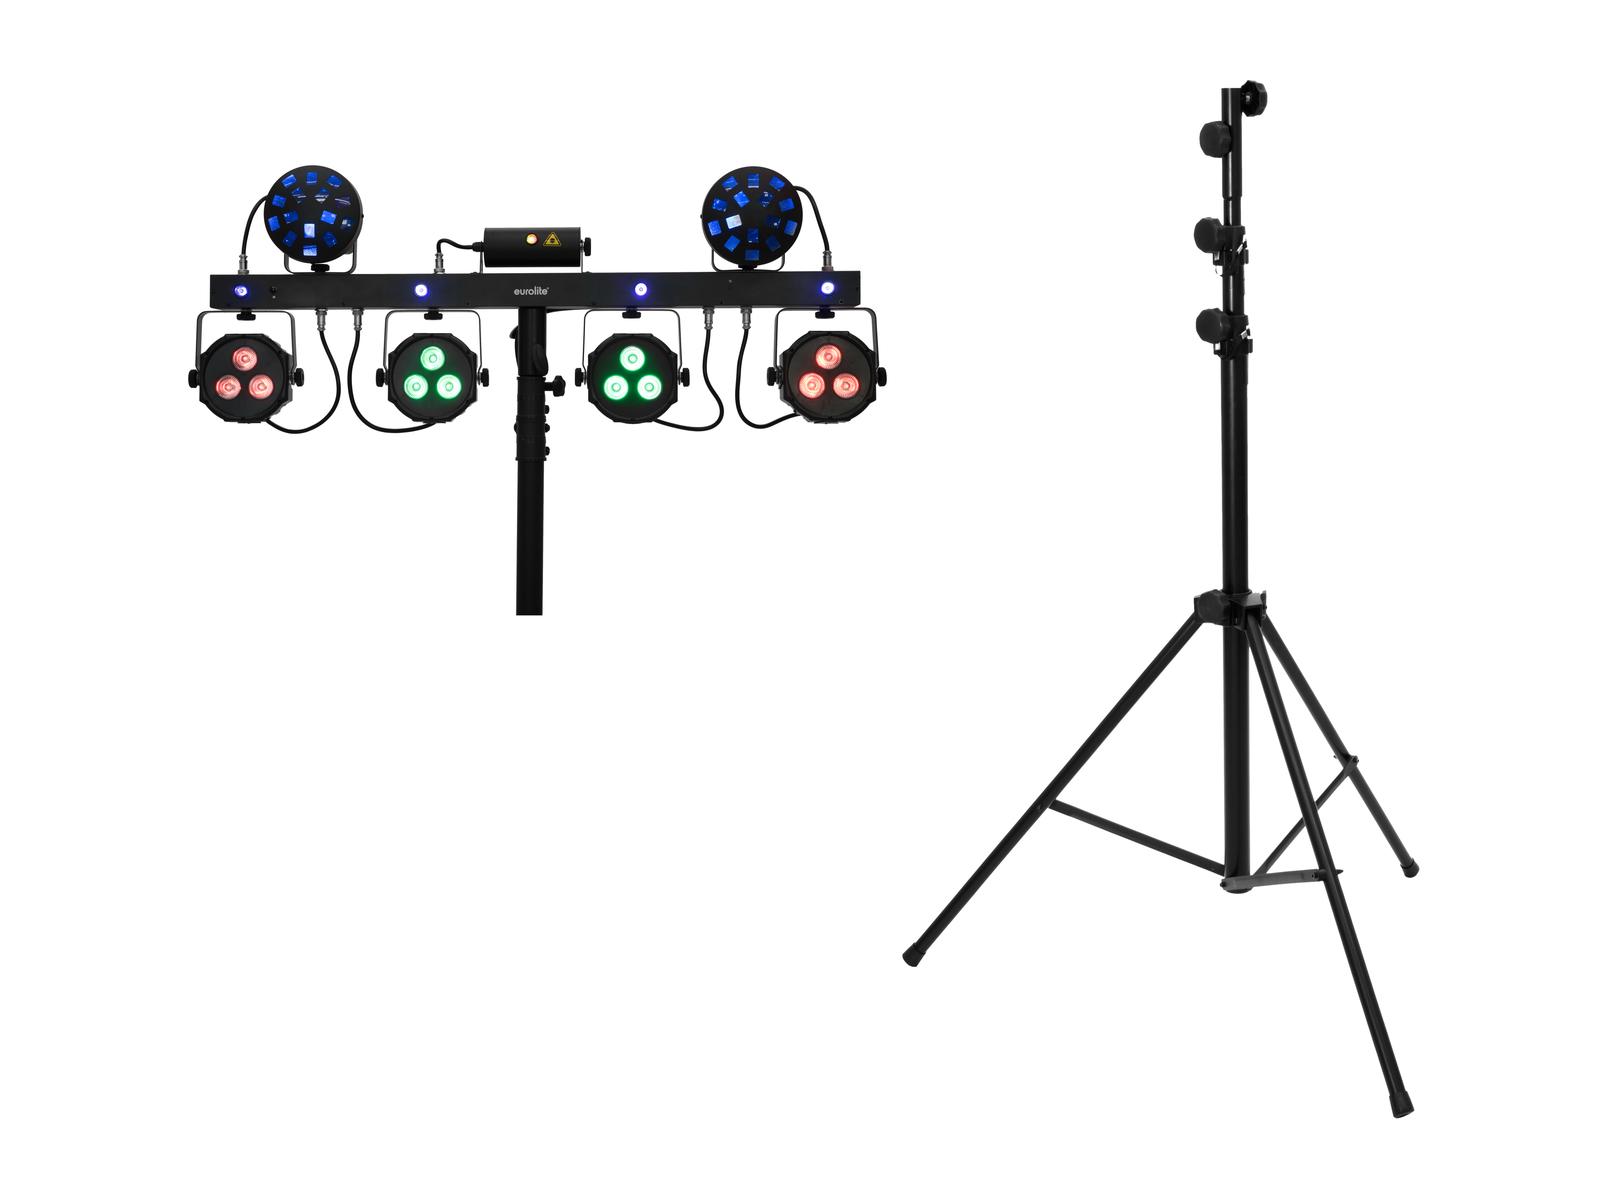 EUROLITE Set LED KLS Laser Bar Next FX-Lichtset + STV-60-WOT EU Stahlstativ schwarz